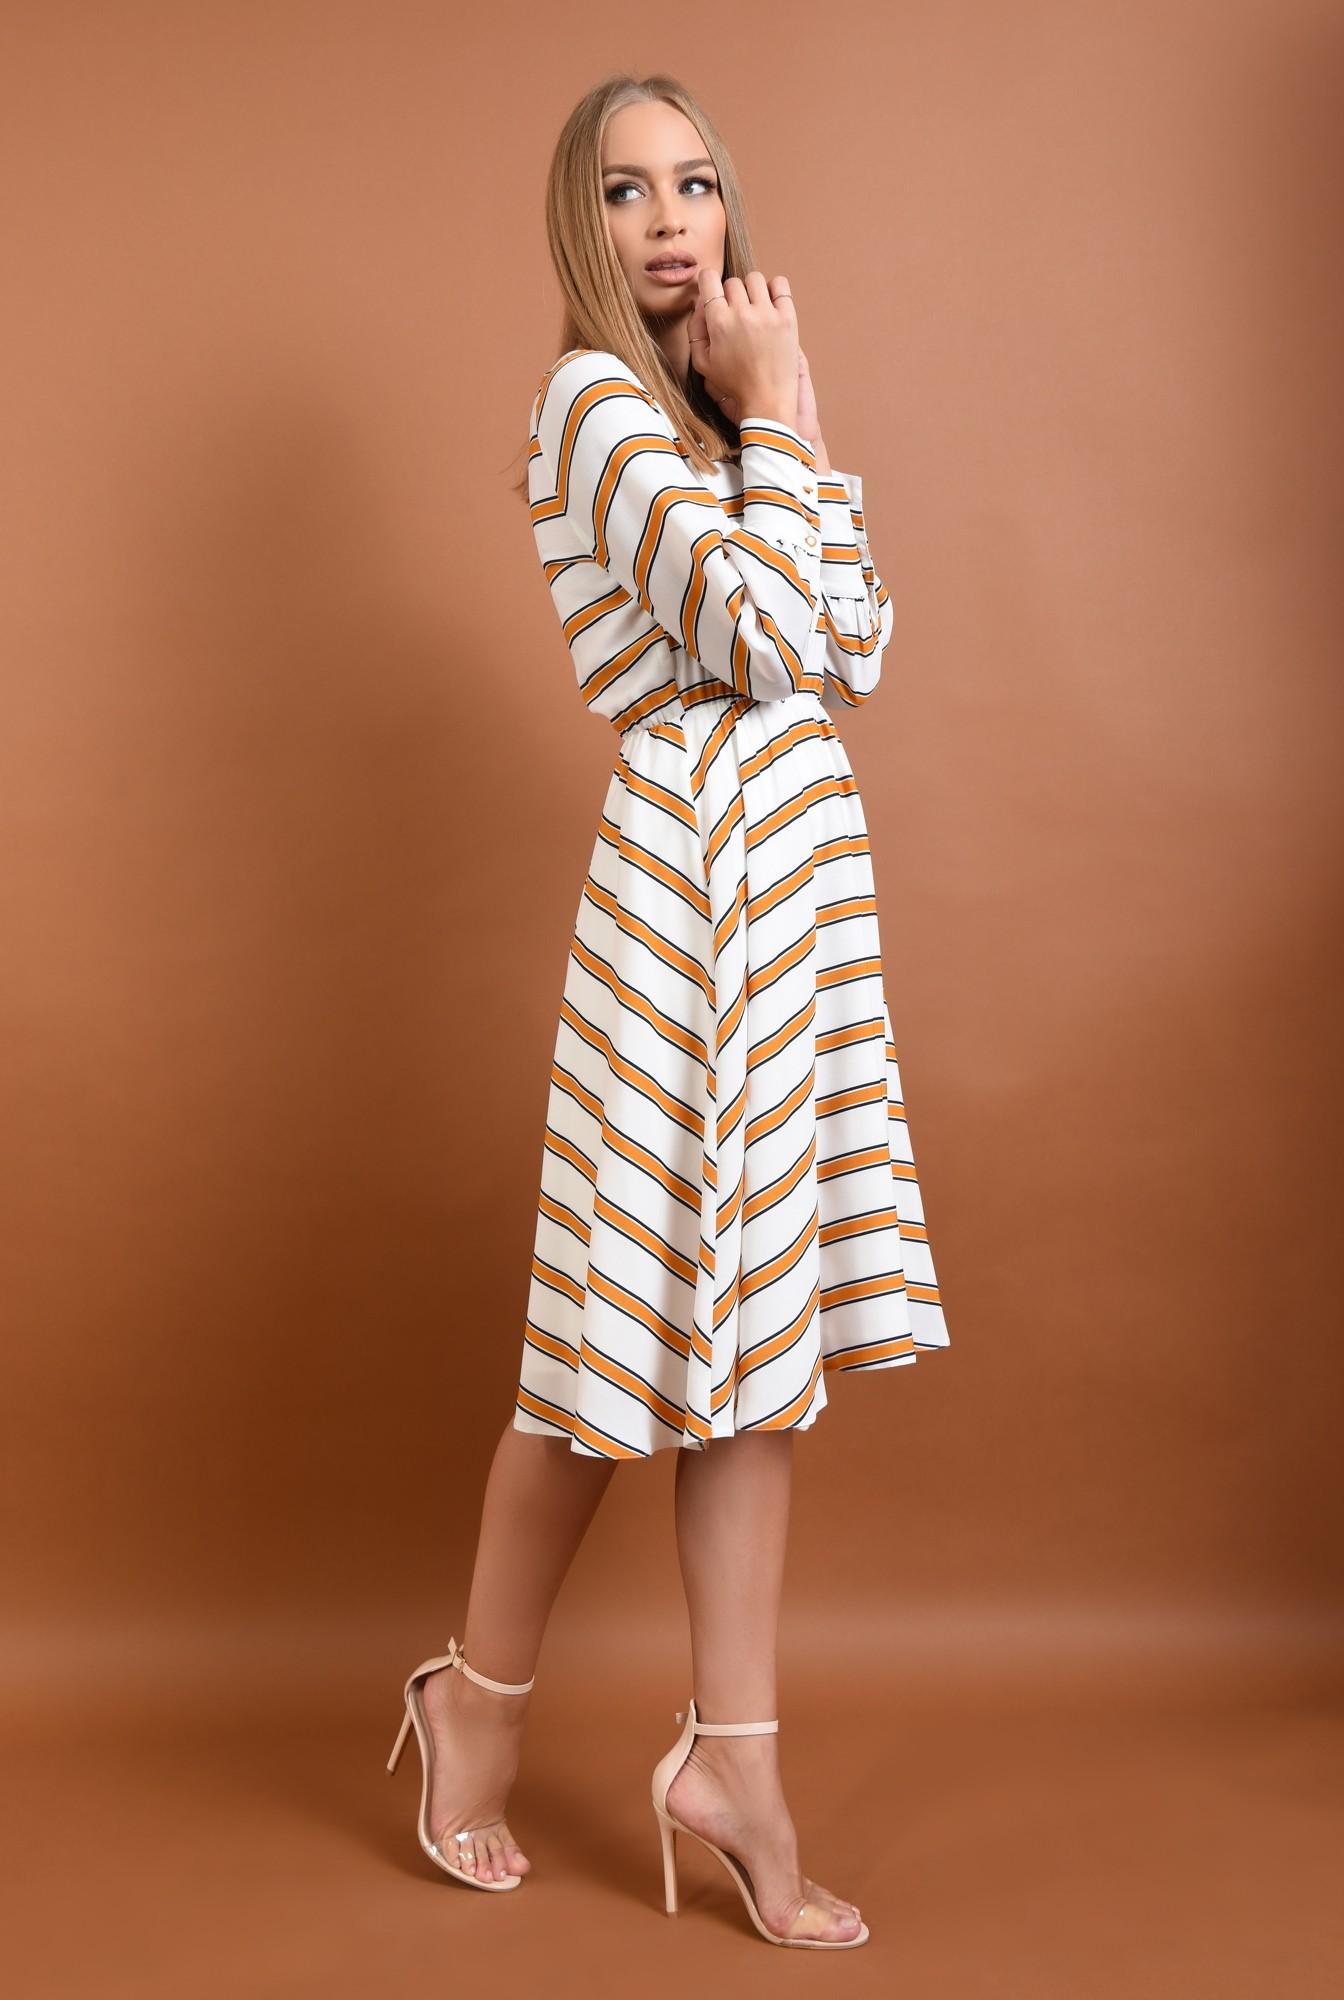 3 - 360 - rochie casual imprimata, alb, mustar, bie, cusatura in talie